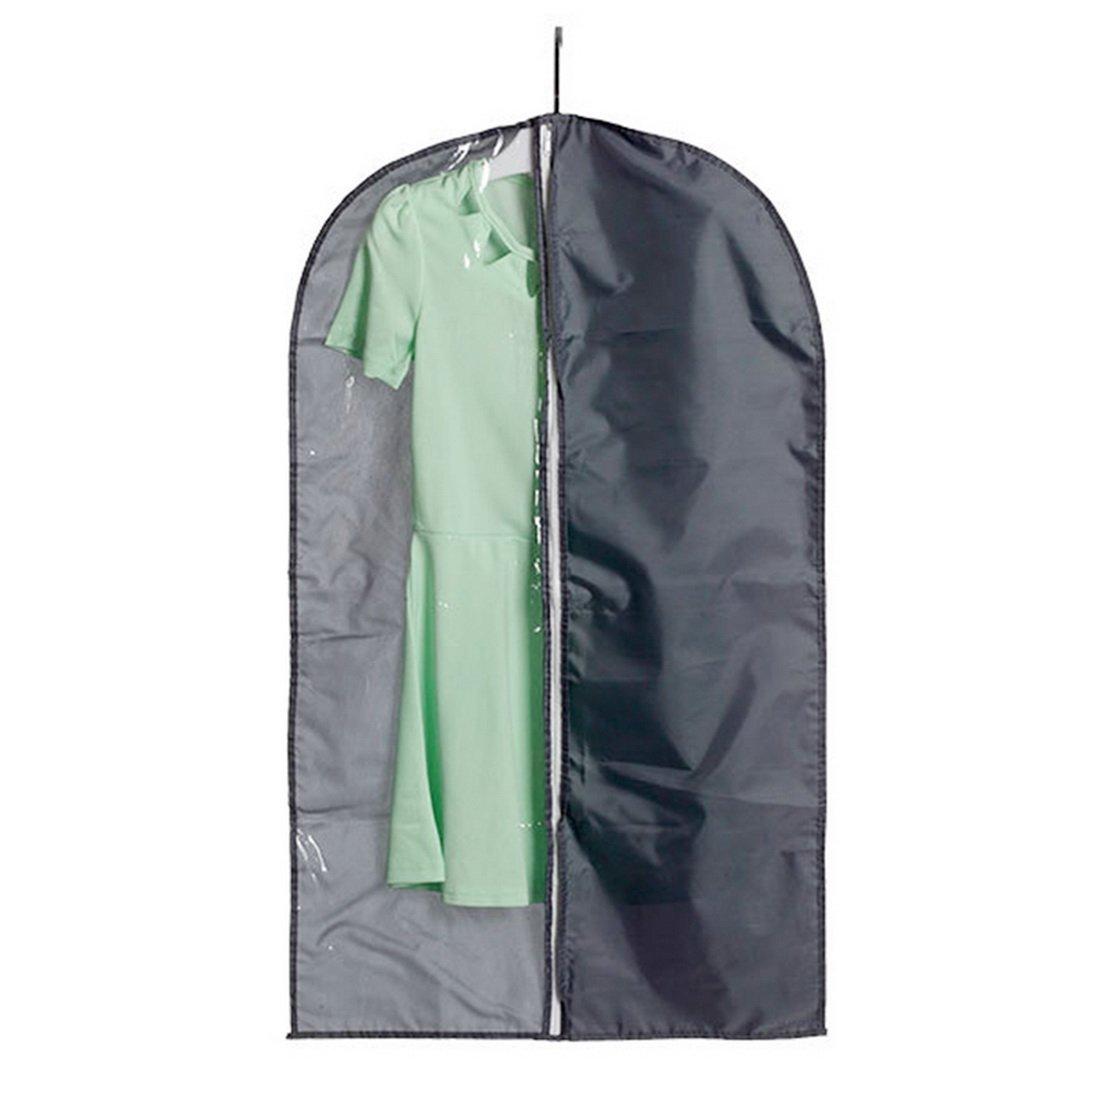 Hoomall Breathable Garment Bags Garment Covers Suit Bag Suit Carriers Dustproof 58x135cm Deep Grey